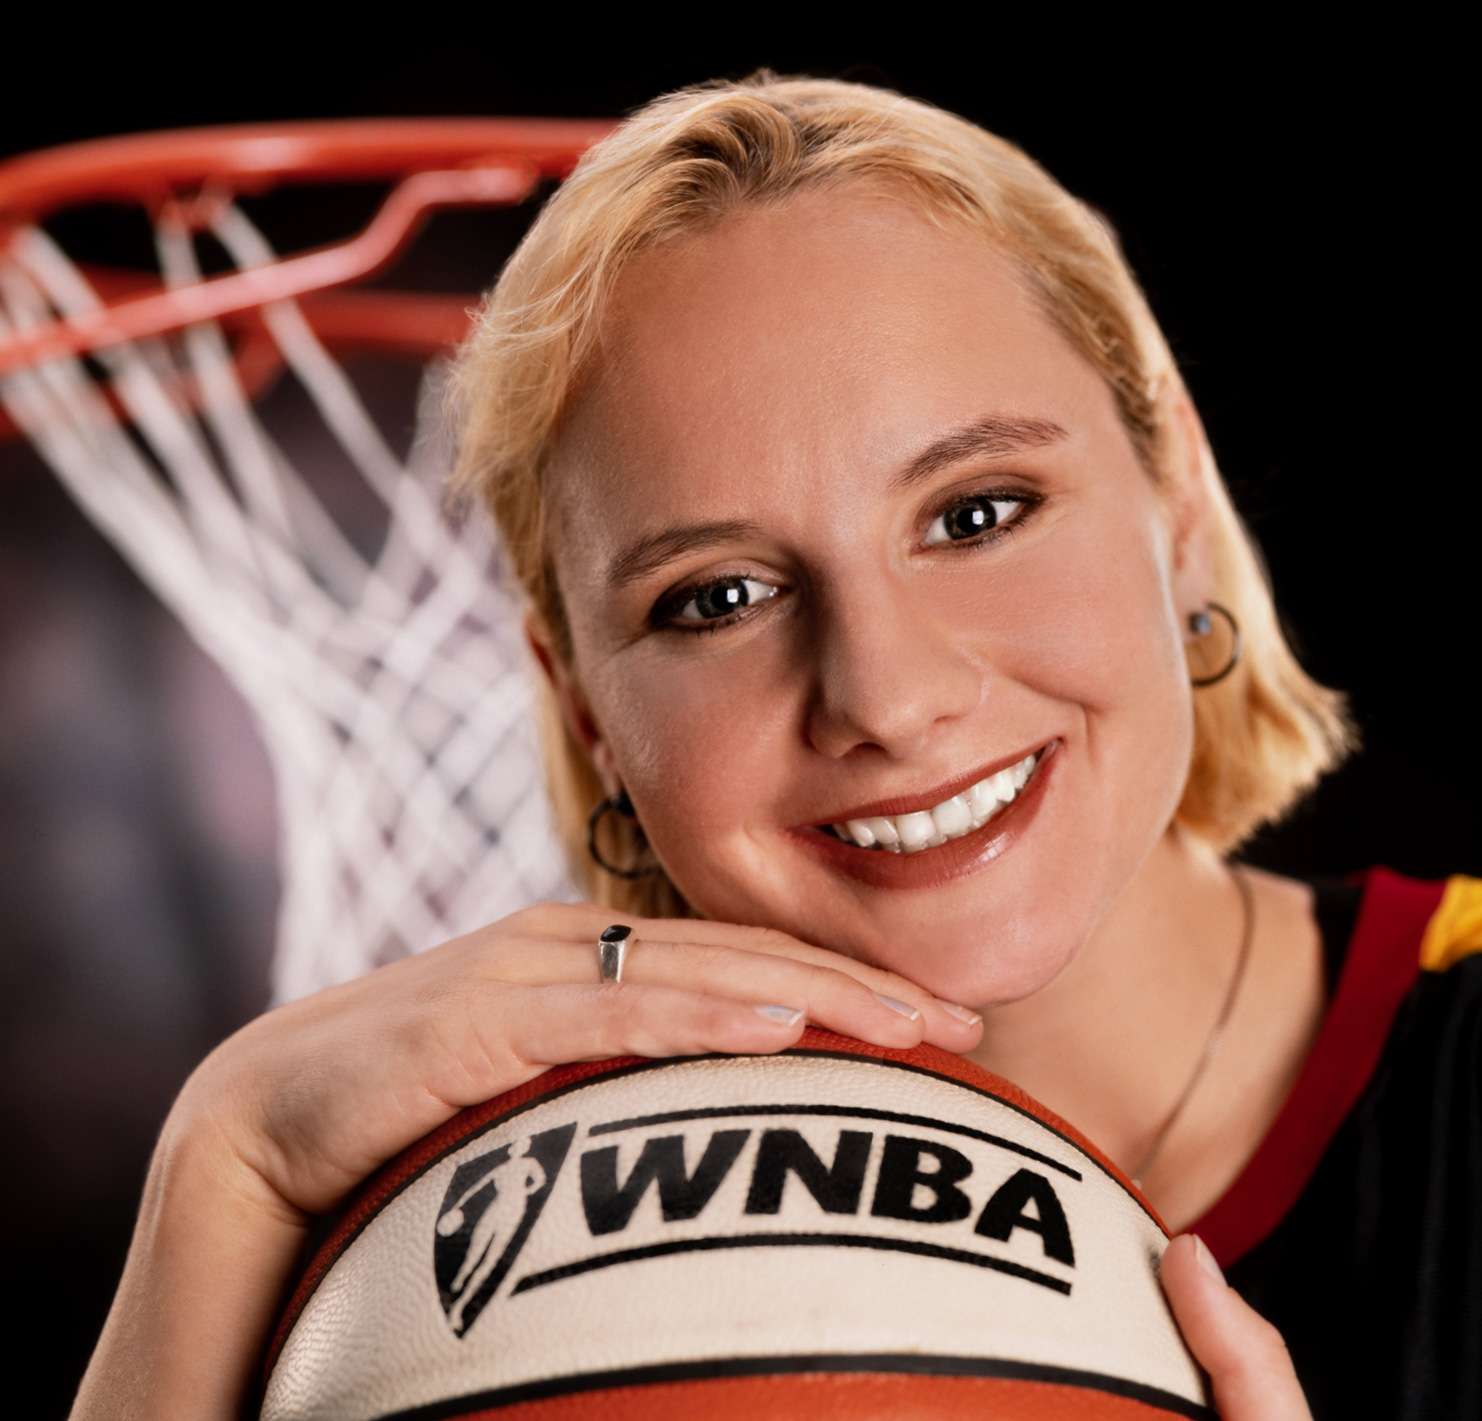 photography of WNBA sports athletes basketball